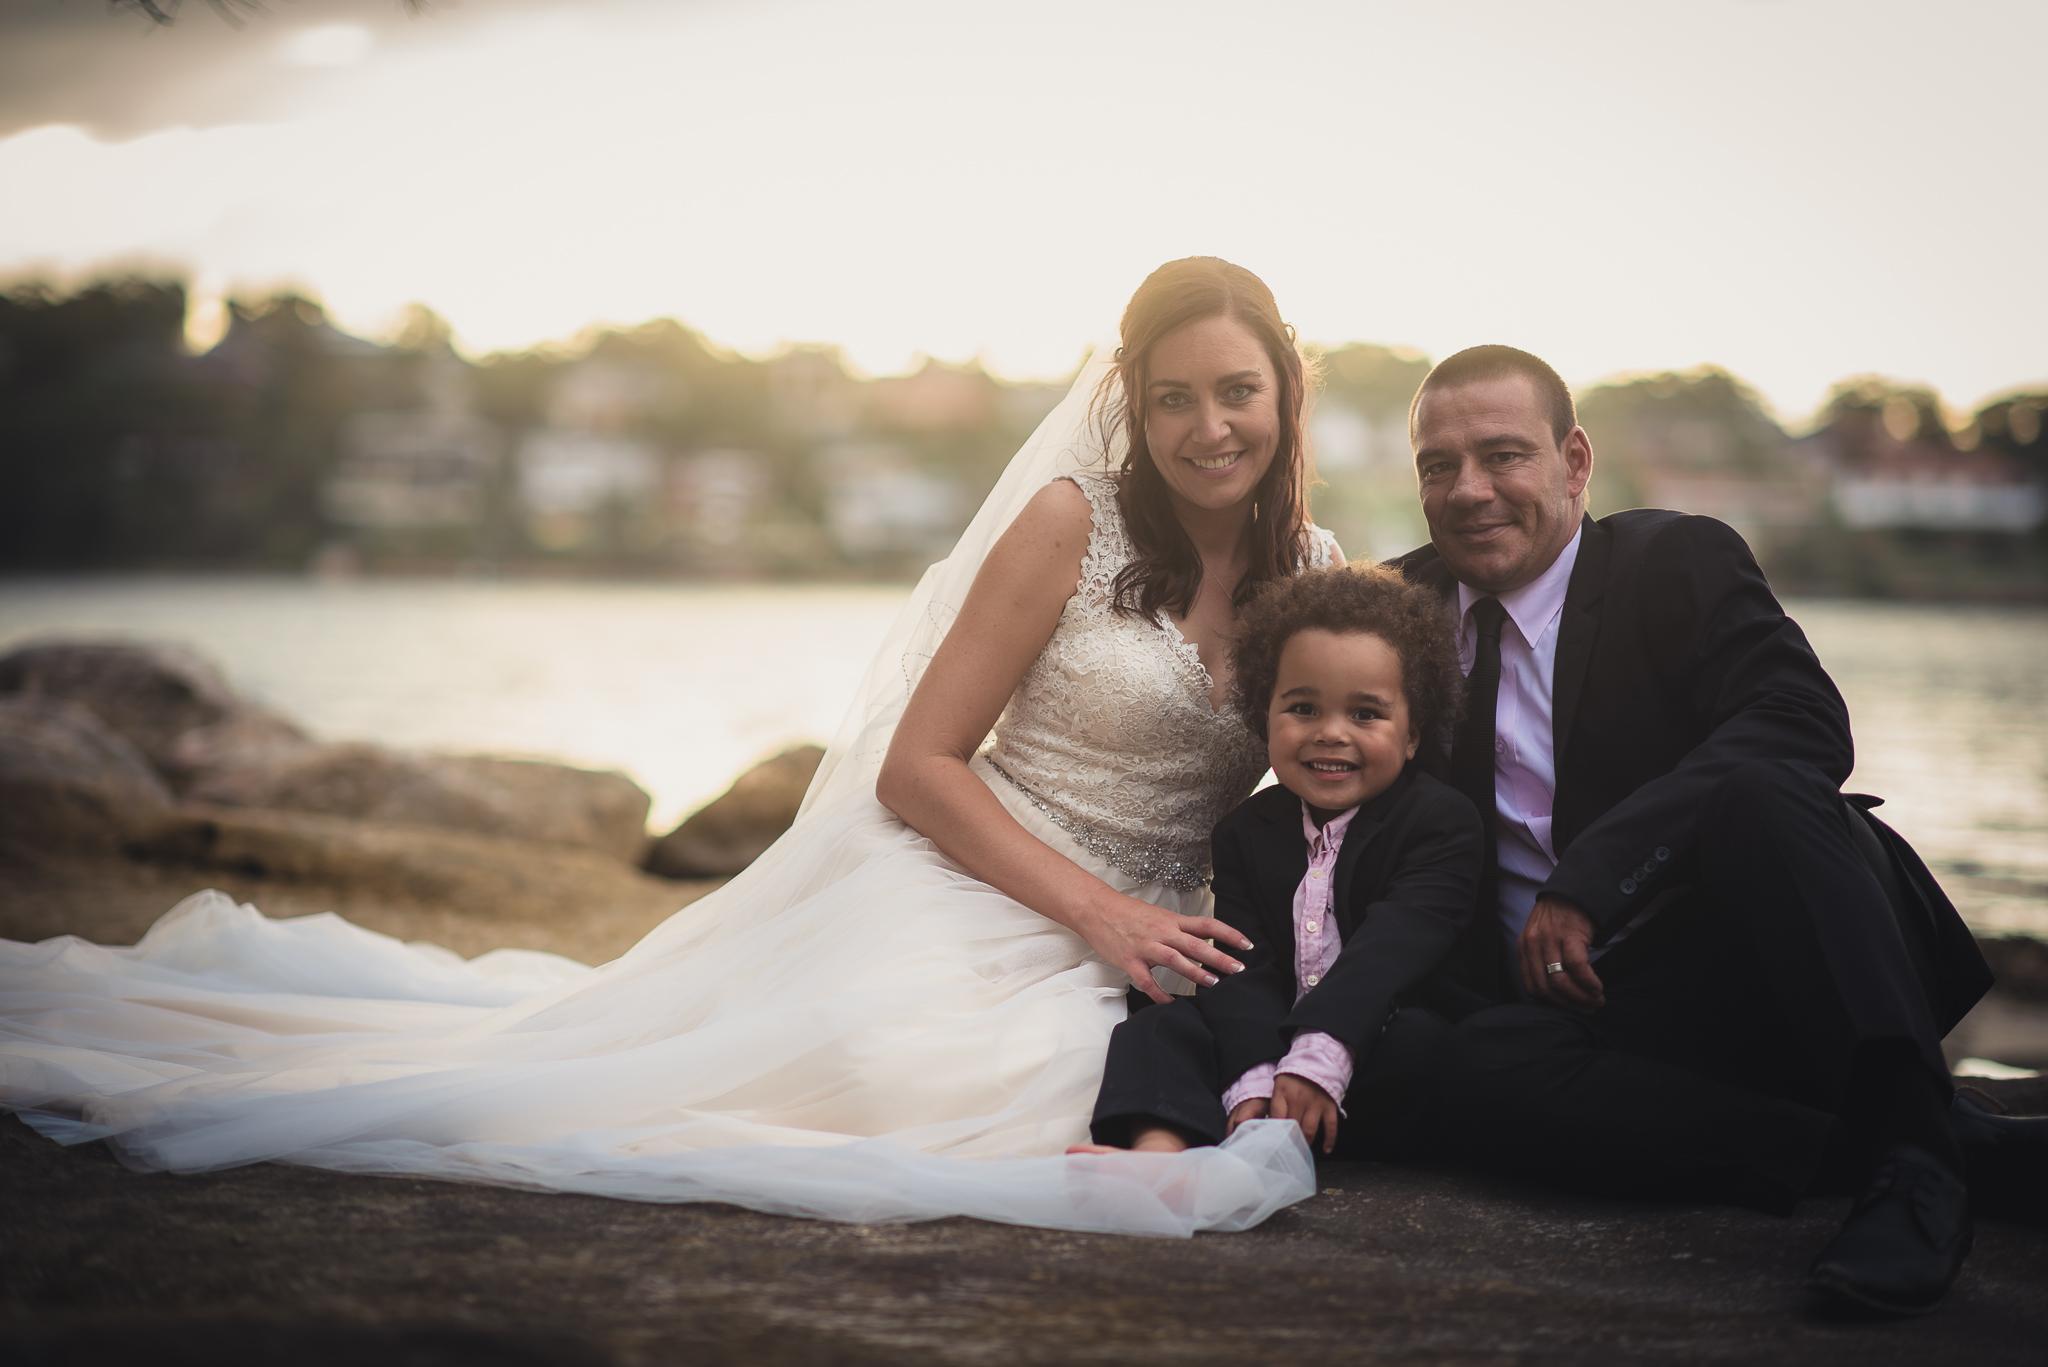 family wedding photo on the beach